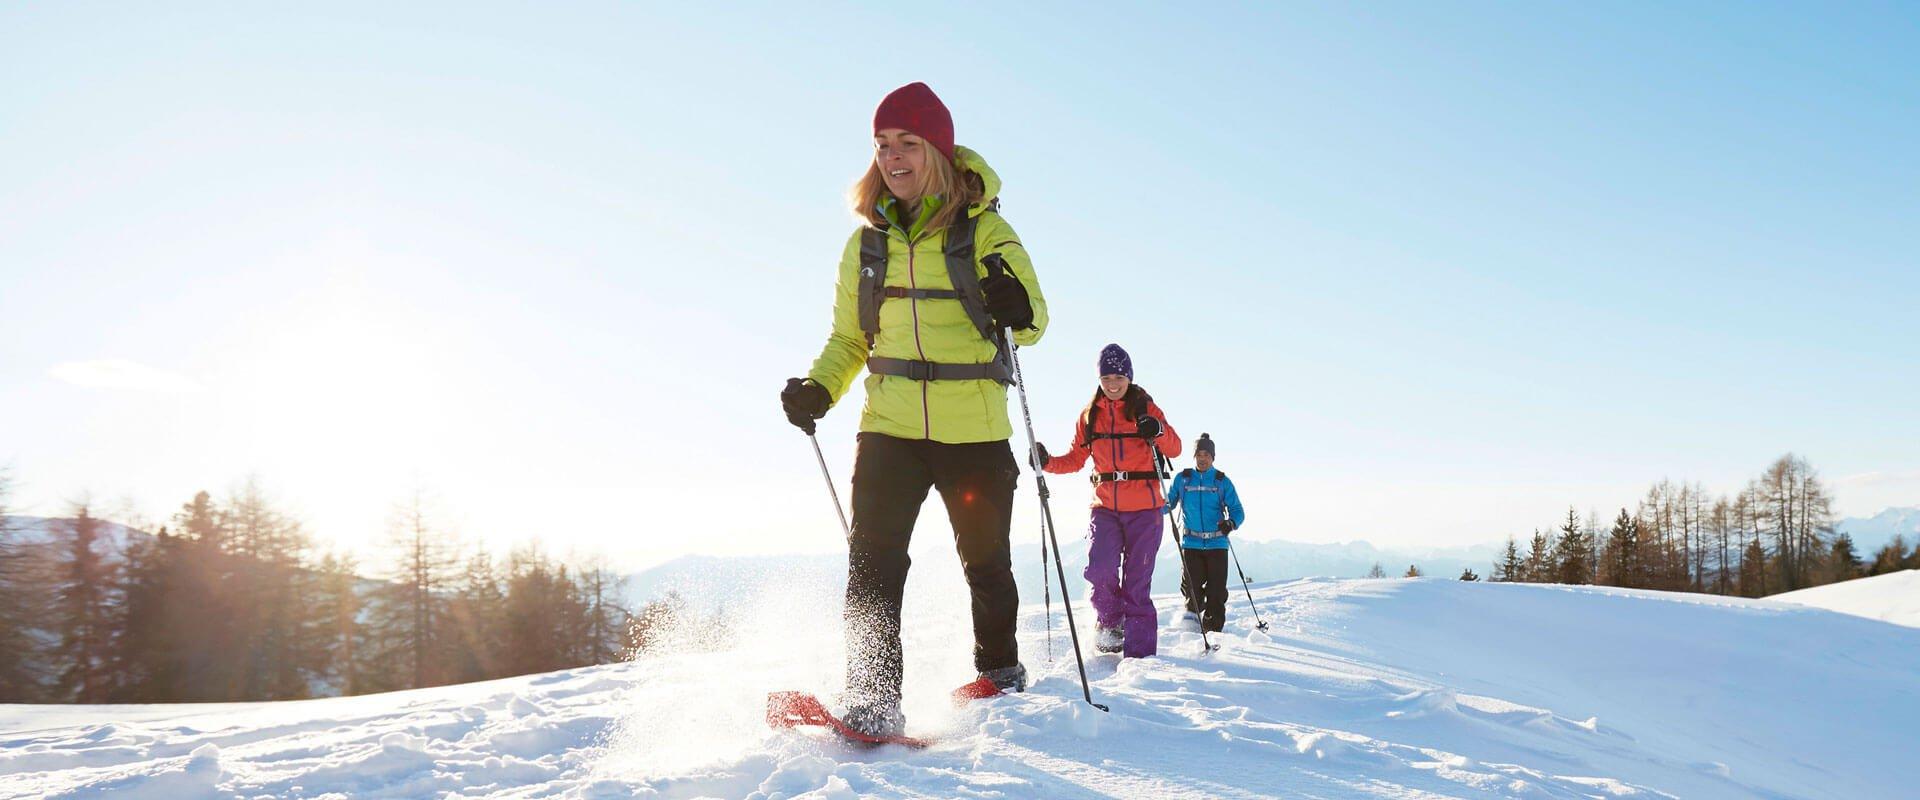 schneeschuhwandern-kreuzwiese-winter-luesen